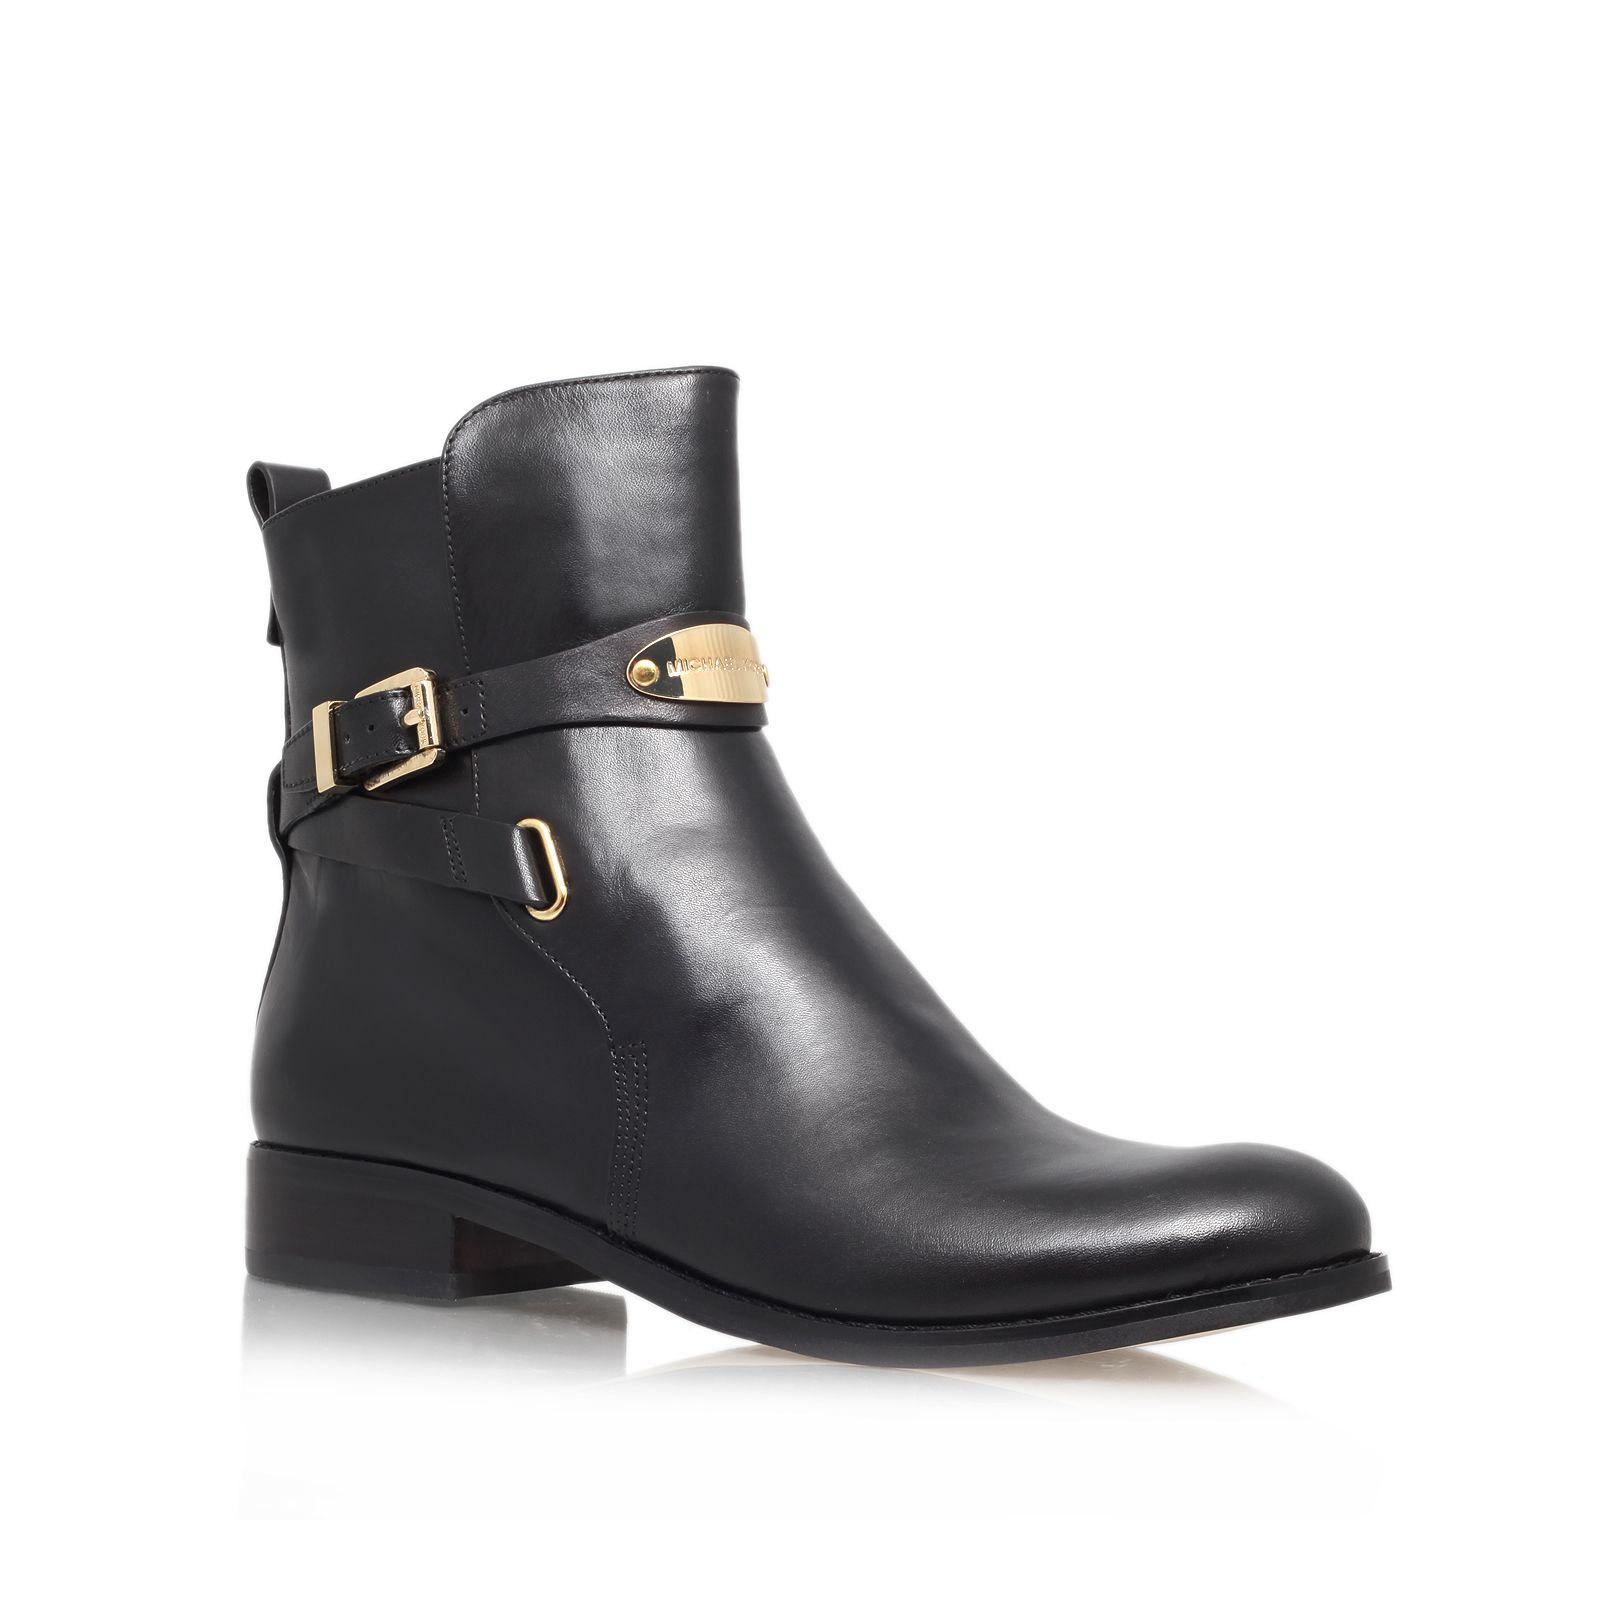 michael kors arley leather ankle boots in black lyst. Black Bedroom Furniture Sets. Home Design Ideas